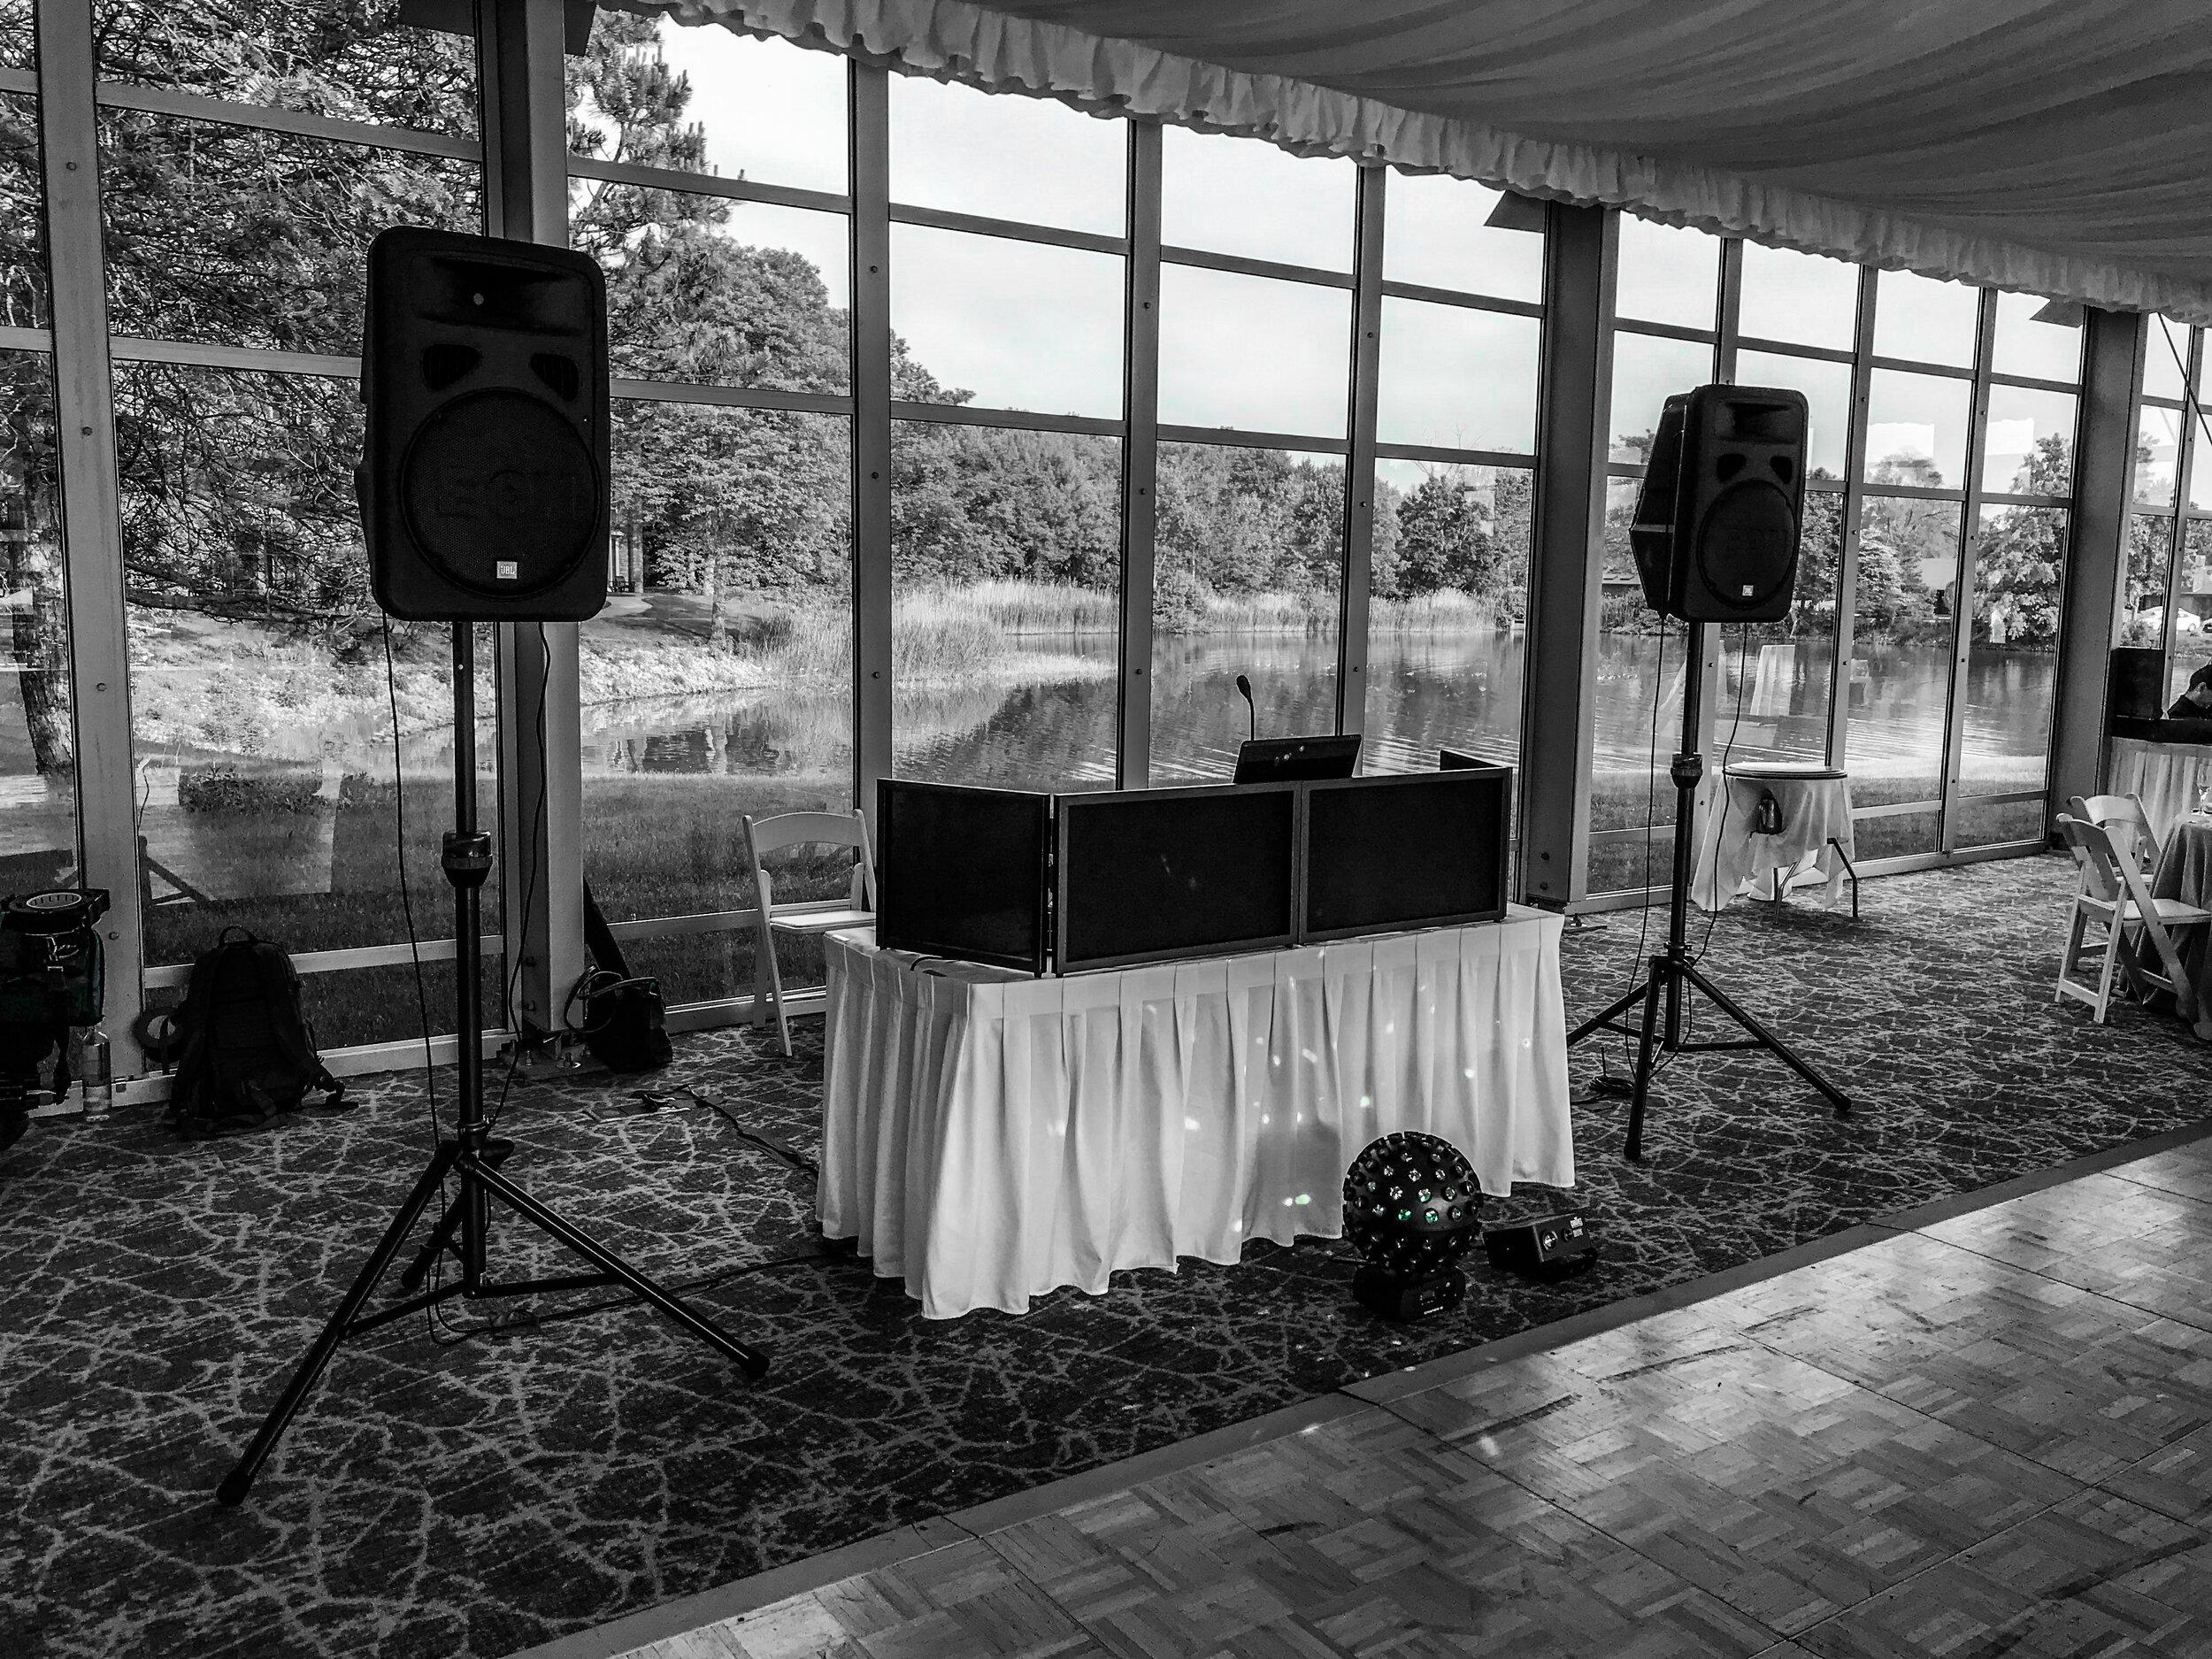 Dancetrax Setup Pics - 2019 - Pic 1.JPG